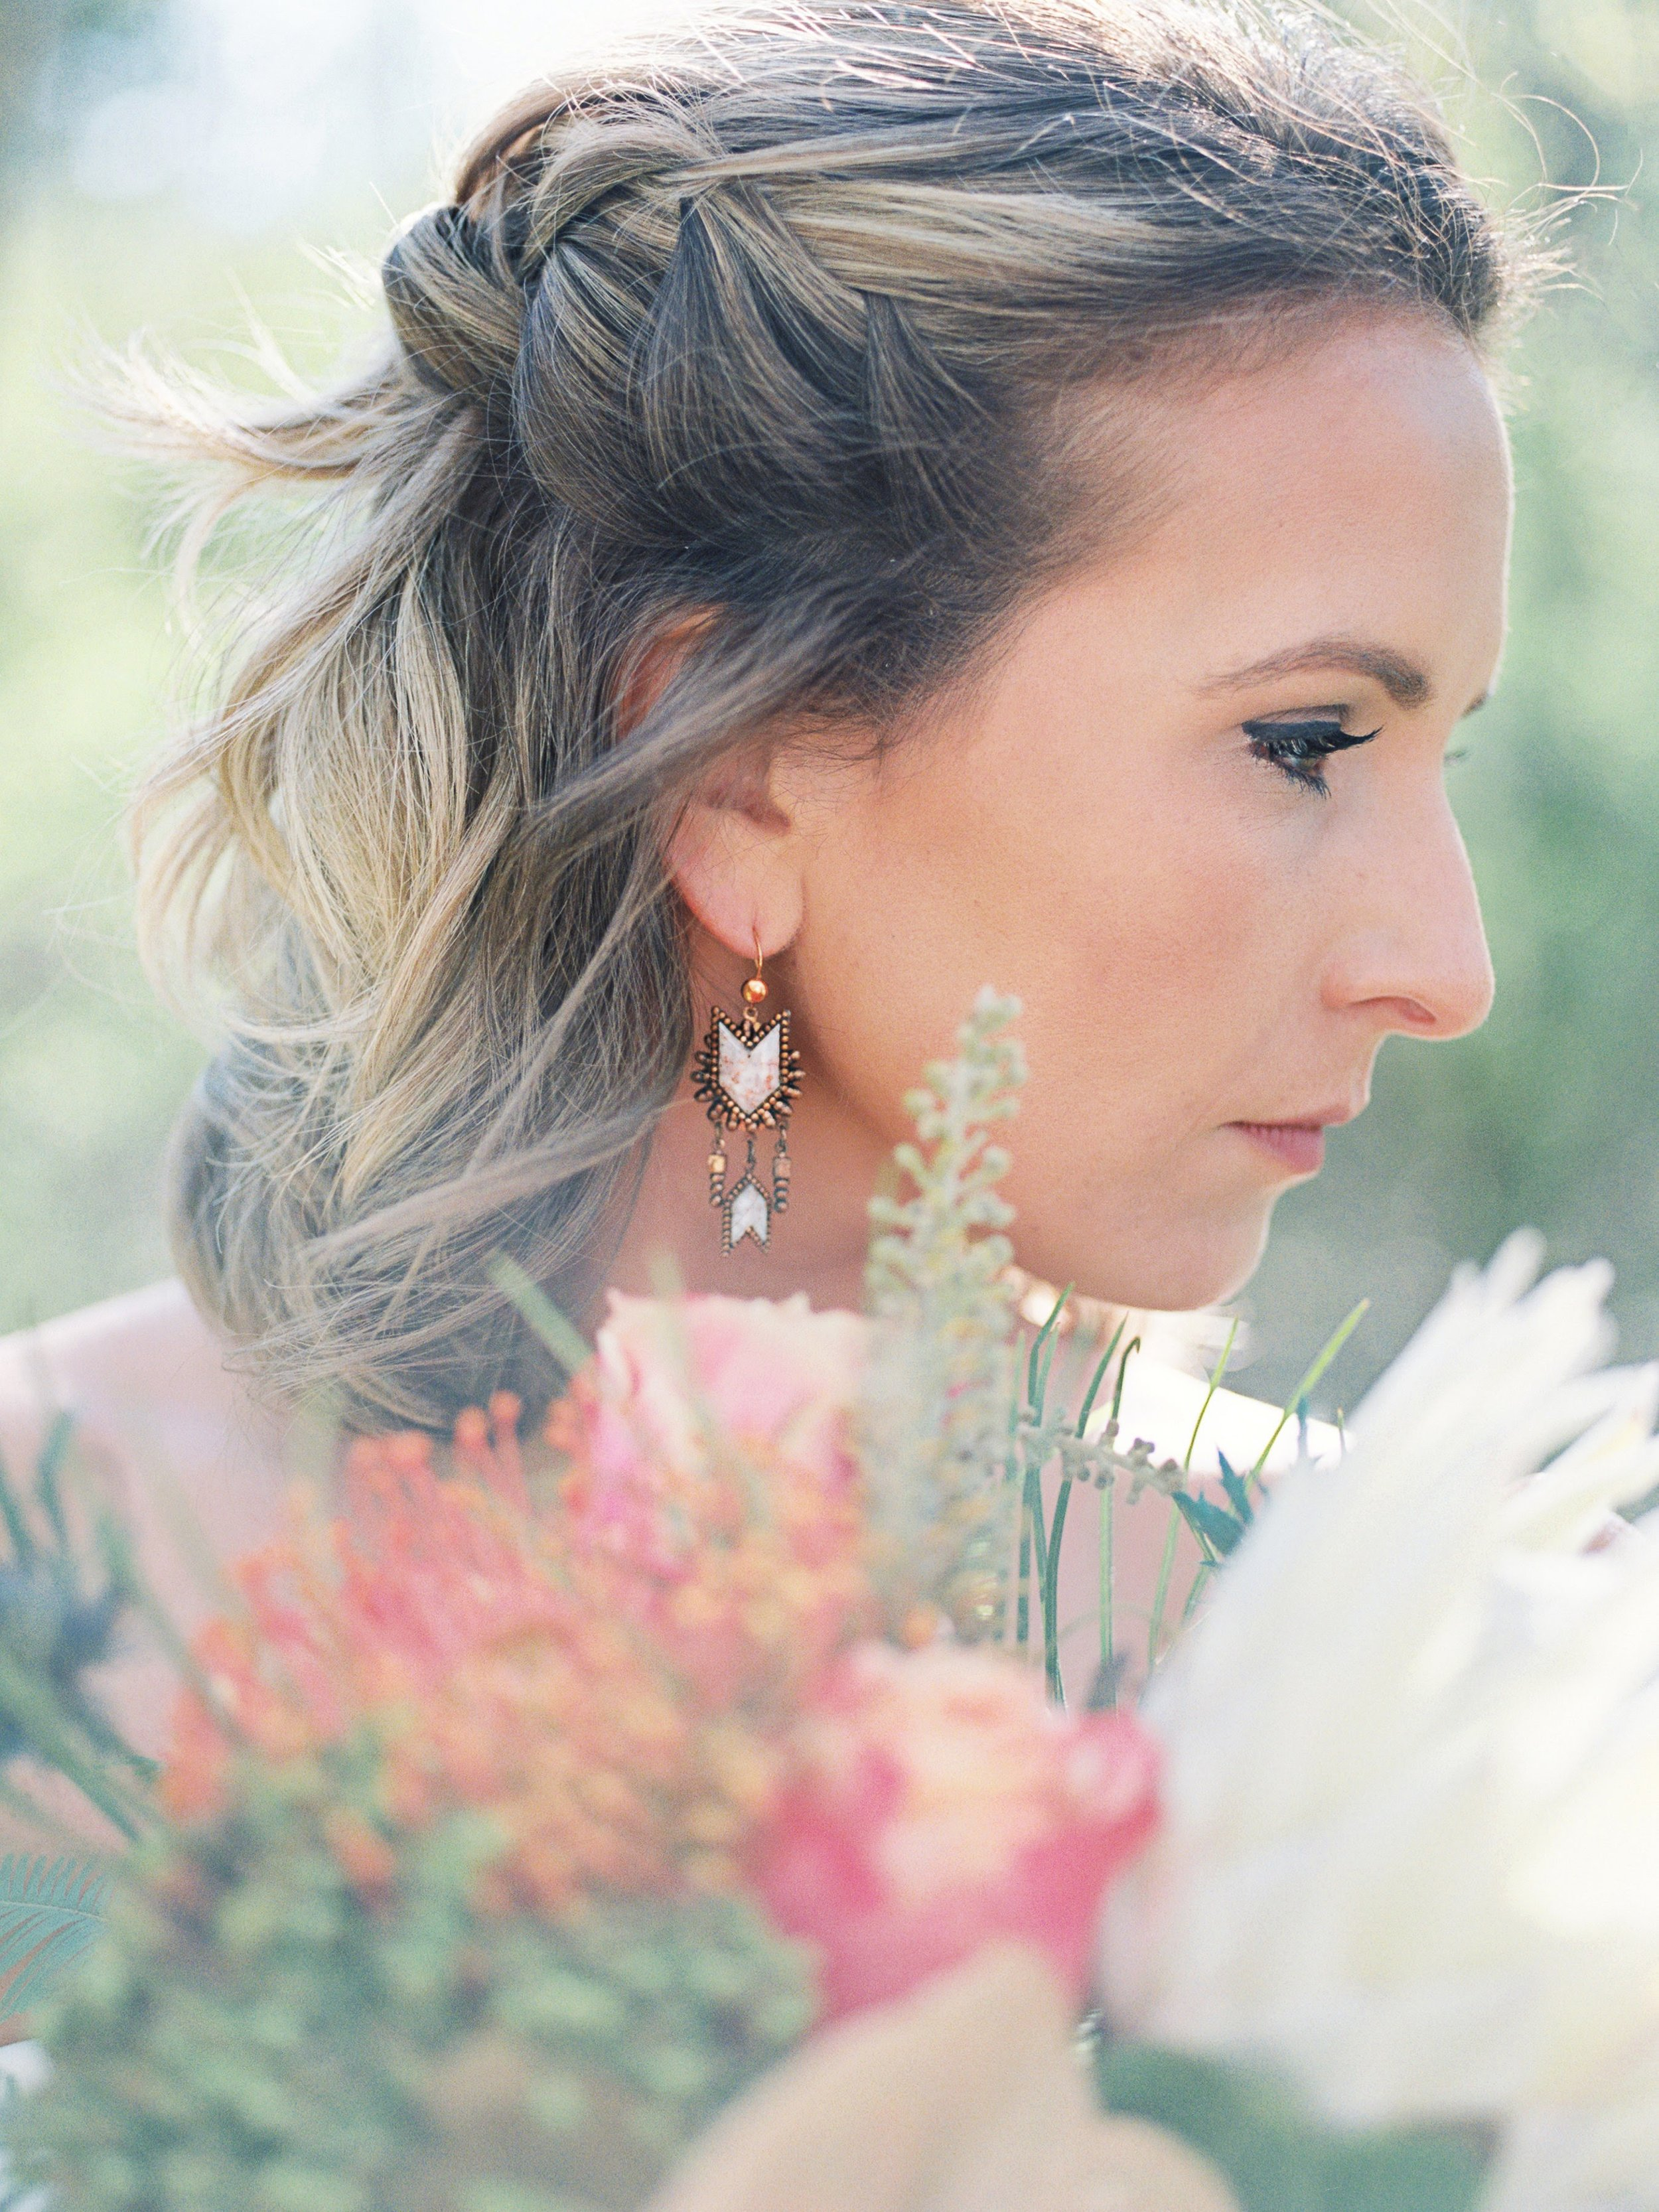 Alexandra-Elise-Photography-Ali-Reed-Film-Wedding-Photographer-Ithaca-New-York-Firelight-Camps-111.jpg